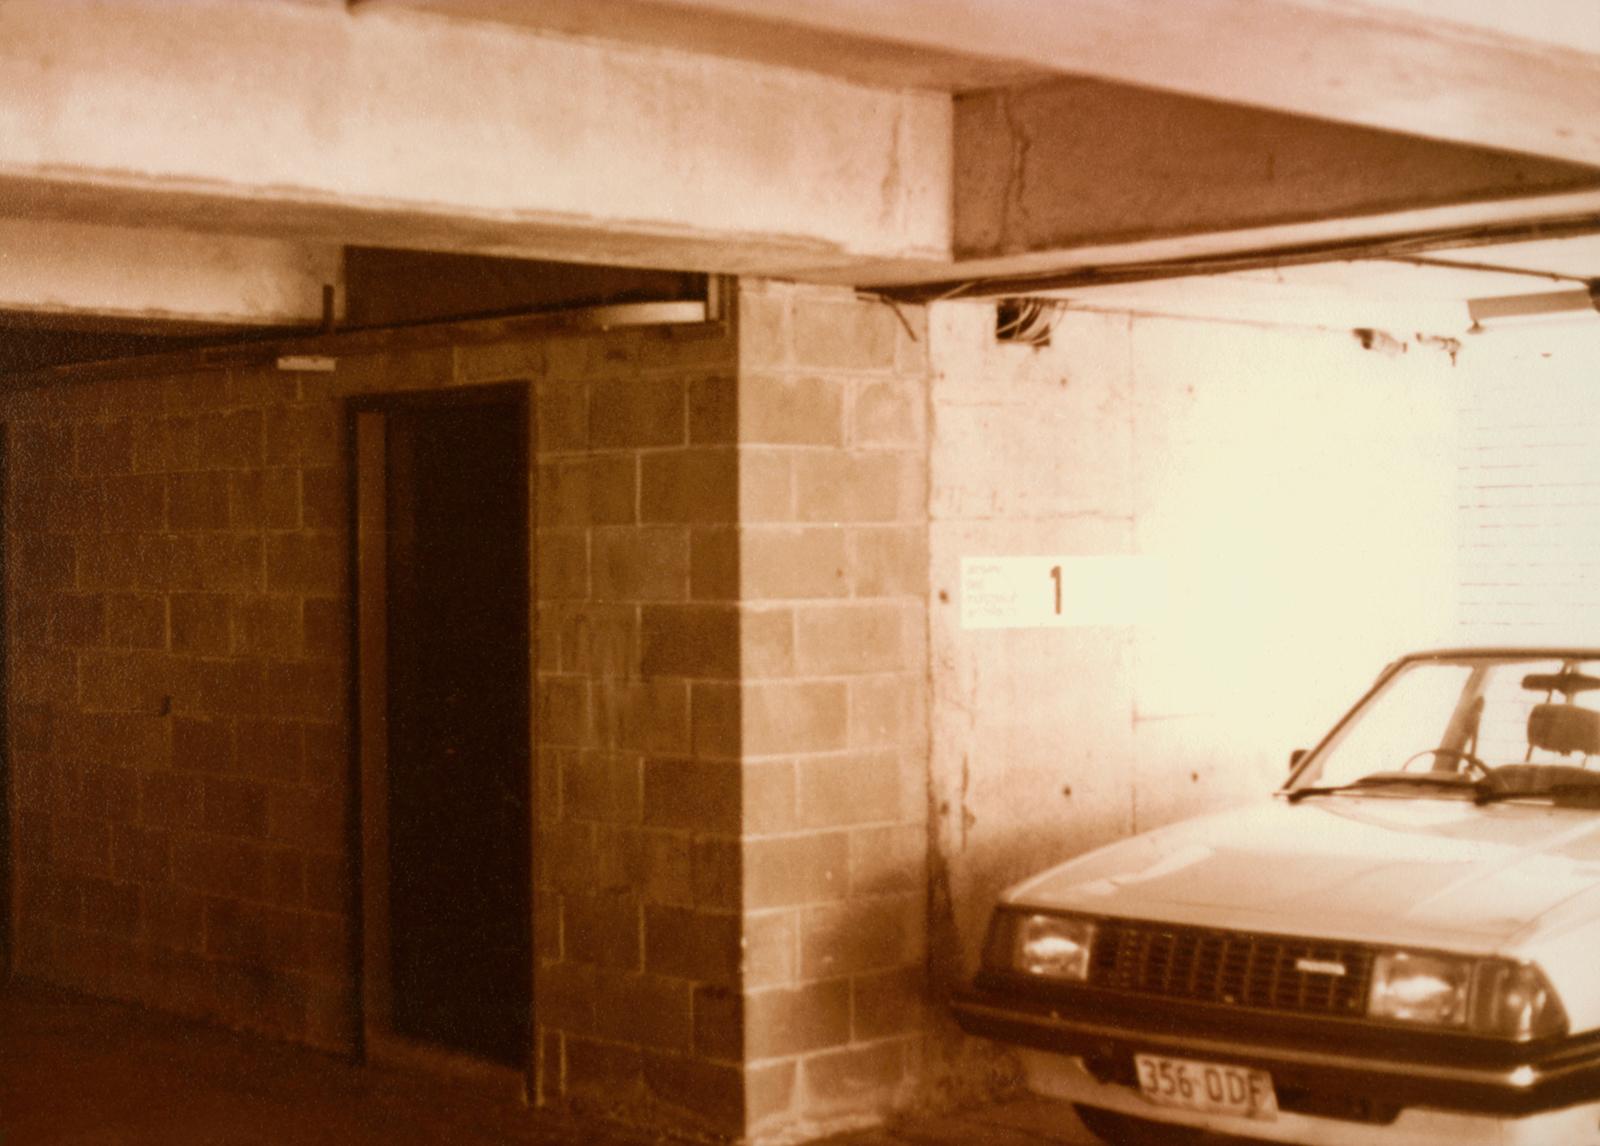 Brisbane - Consulate Office Building - 1983